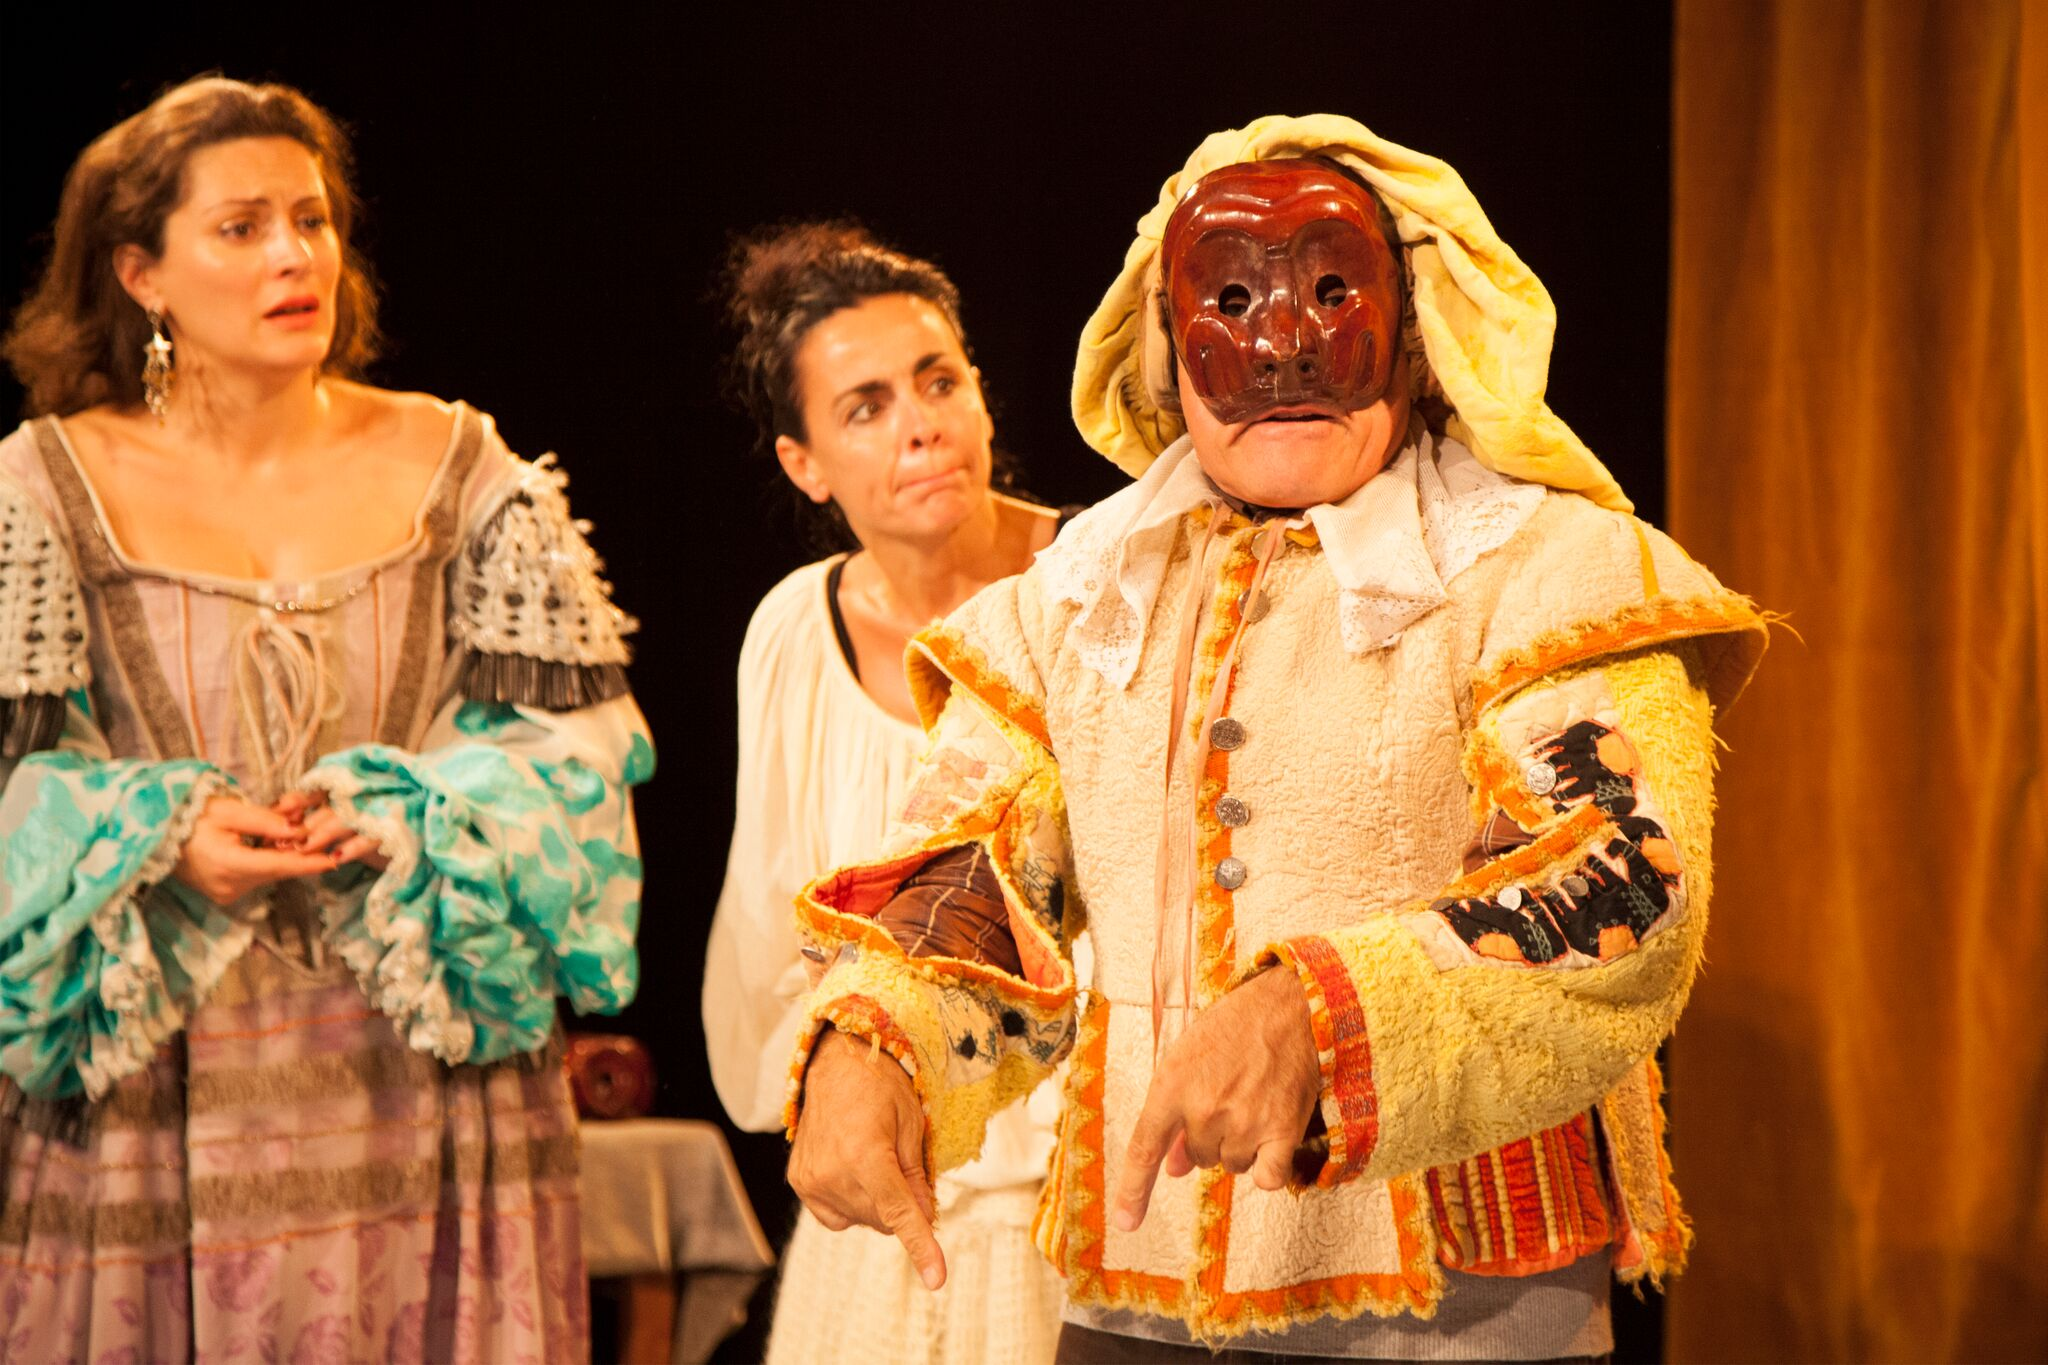 4 avr. : Teatro comico